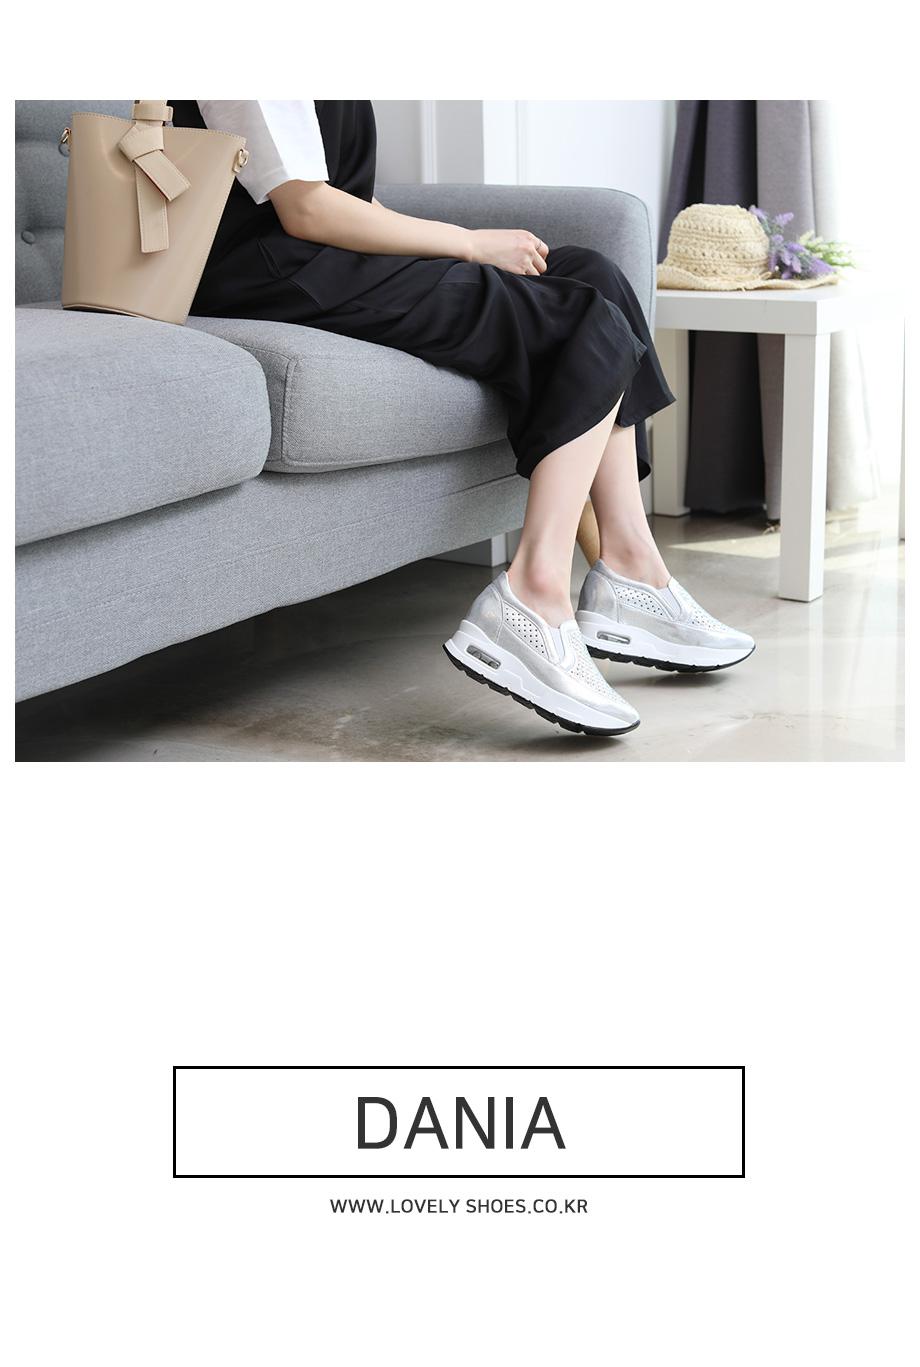 Dania Kinoe Air Slip On 6cm